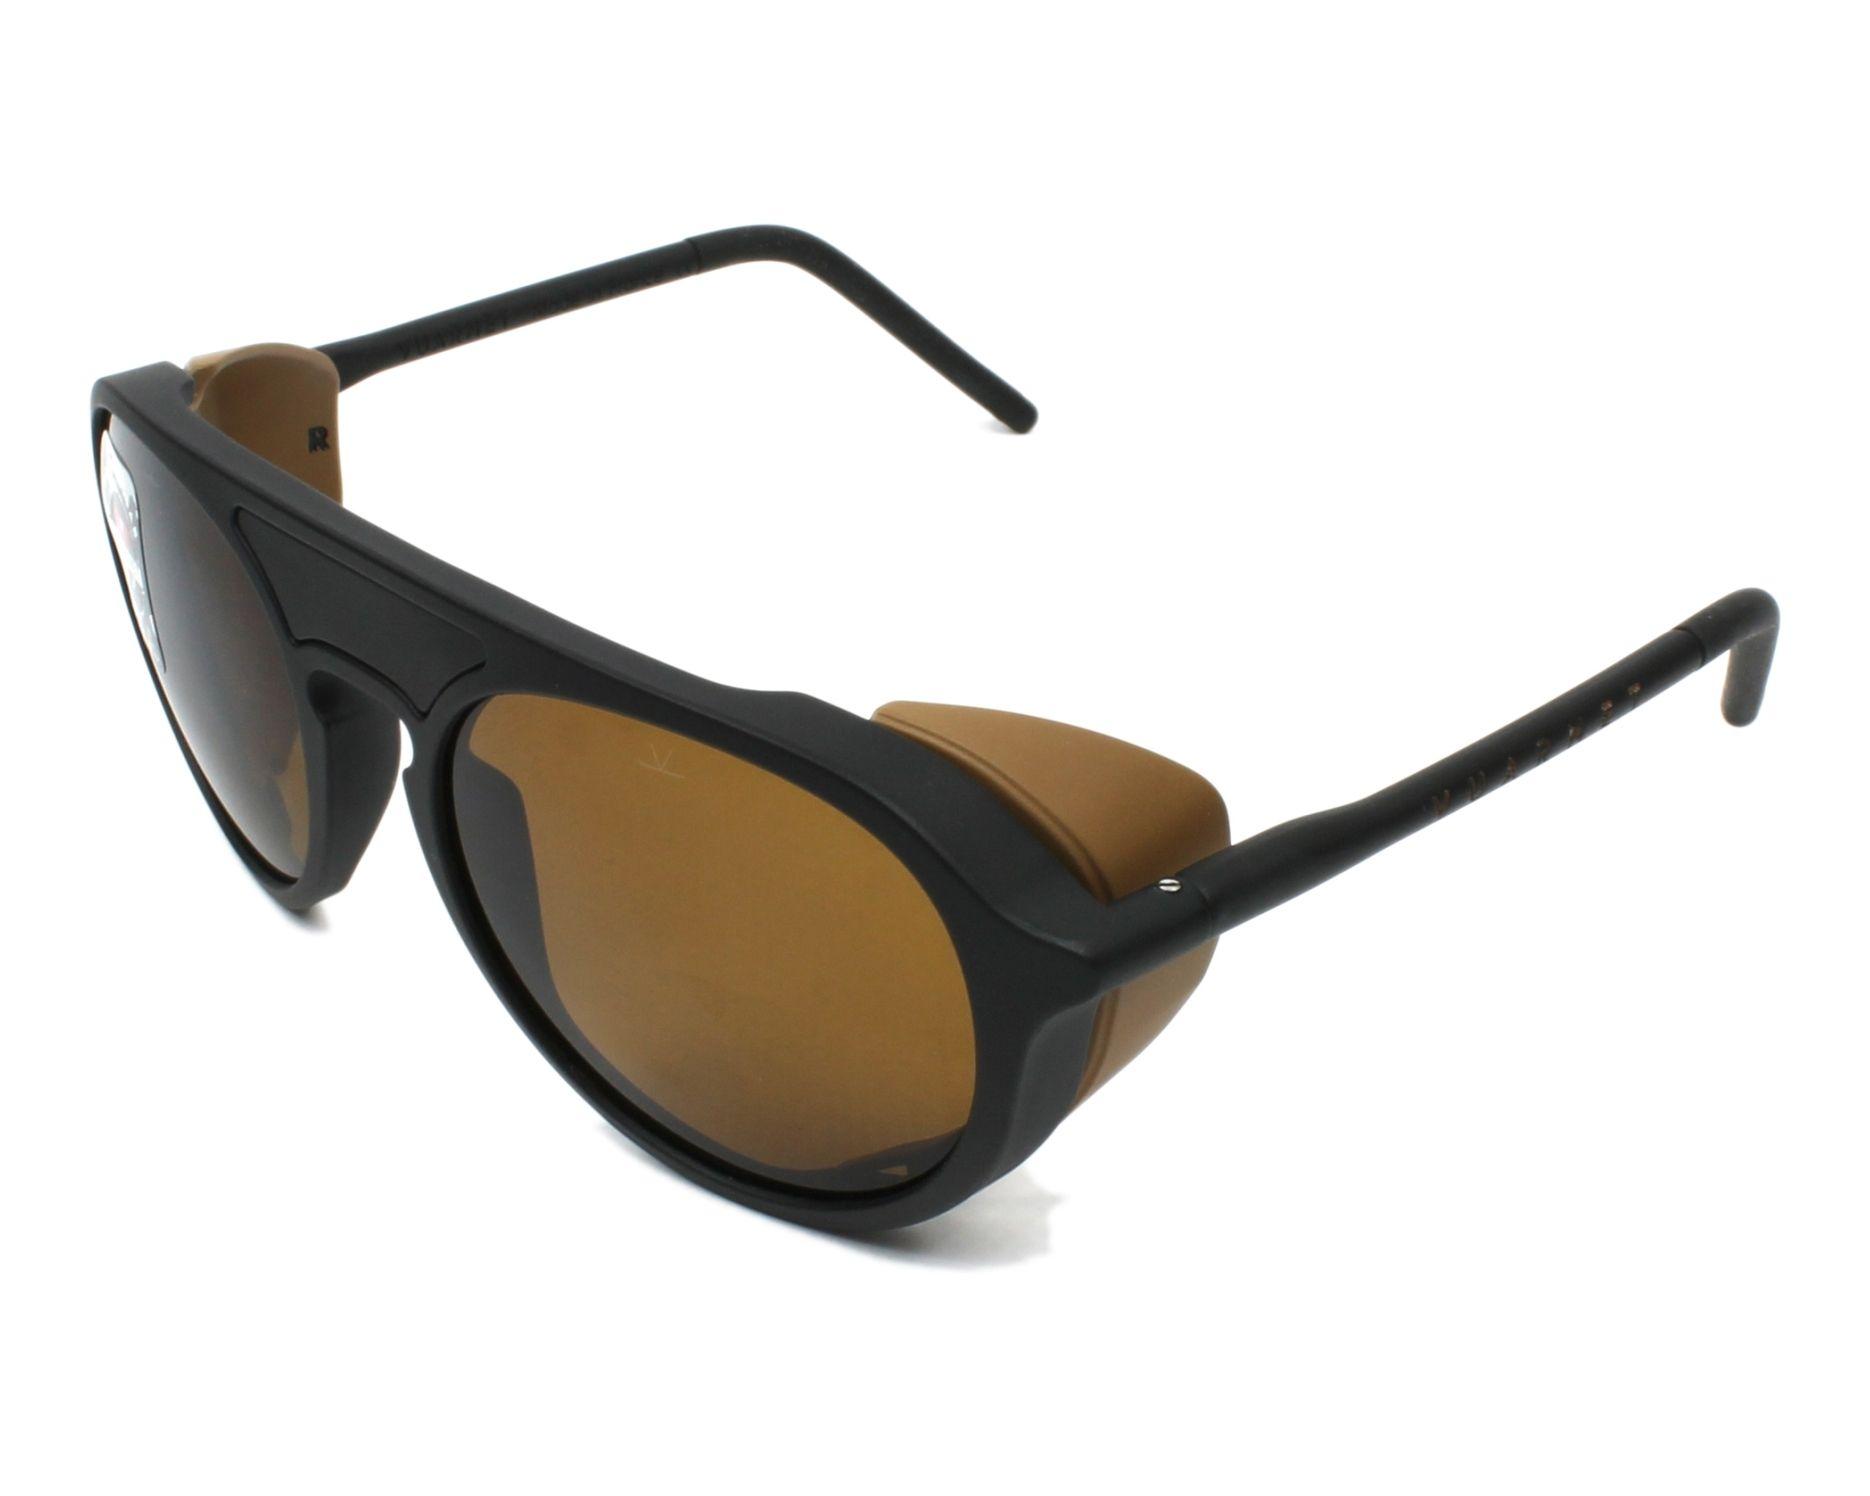 6a94ffad44fb4 Sunglasses Vuarnet VL-1709 0002-2622 51-18 Black profile view